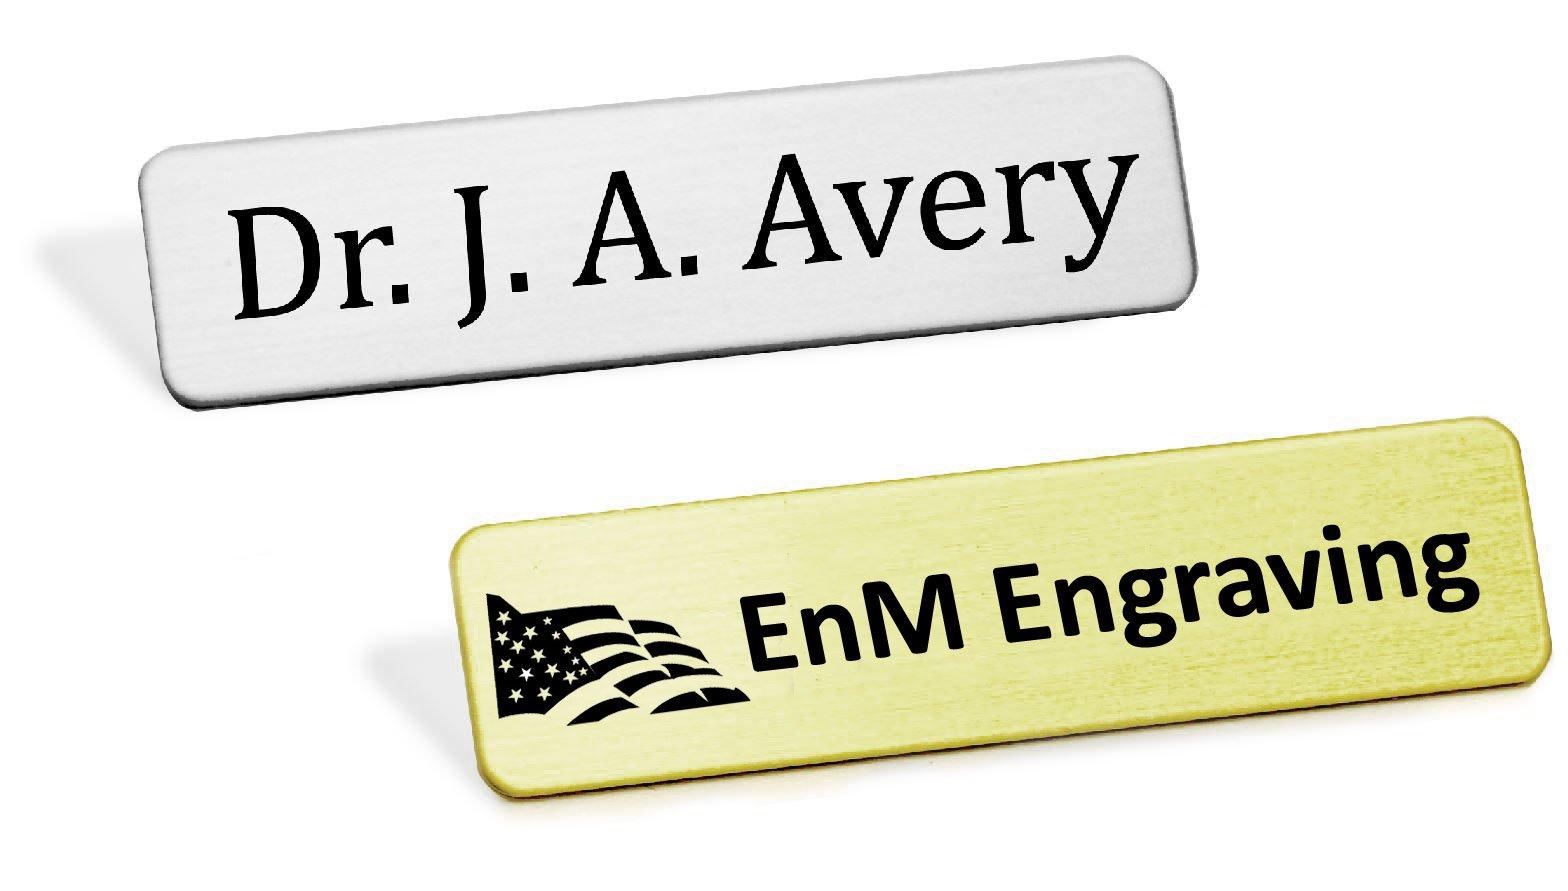 Heavy Gauge Military Style Metal Name Badge, Custom Engraved Uniform Name Badge, Fused Posts, 1/2'' H x 2-3/8'' W Or 5/8'' H x 2-1/2'' W